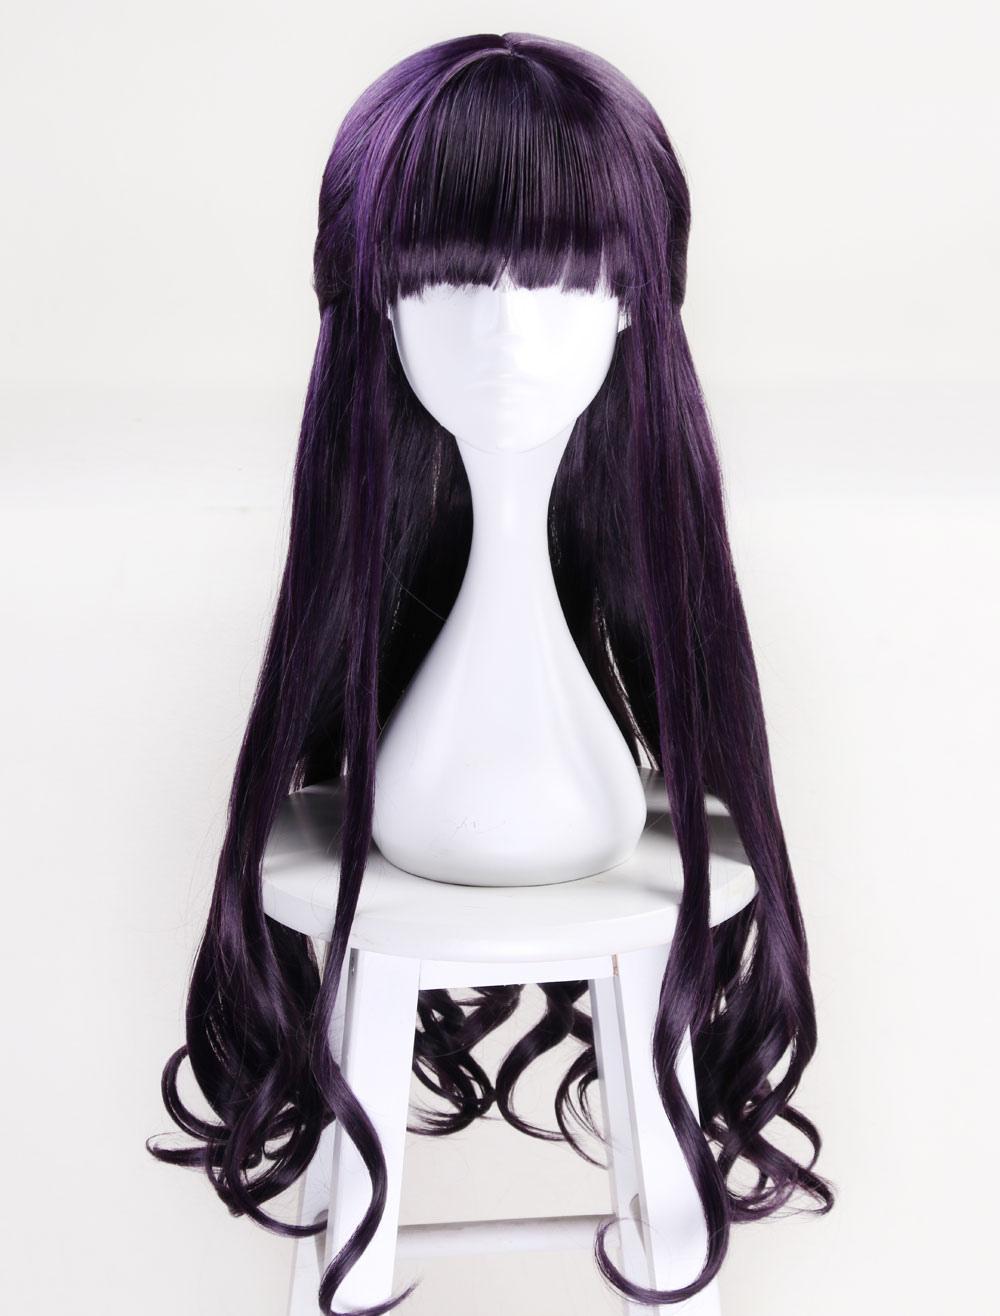 Cardcaptor Sakura Tomoyo Daidouji Cosplay Wig